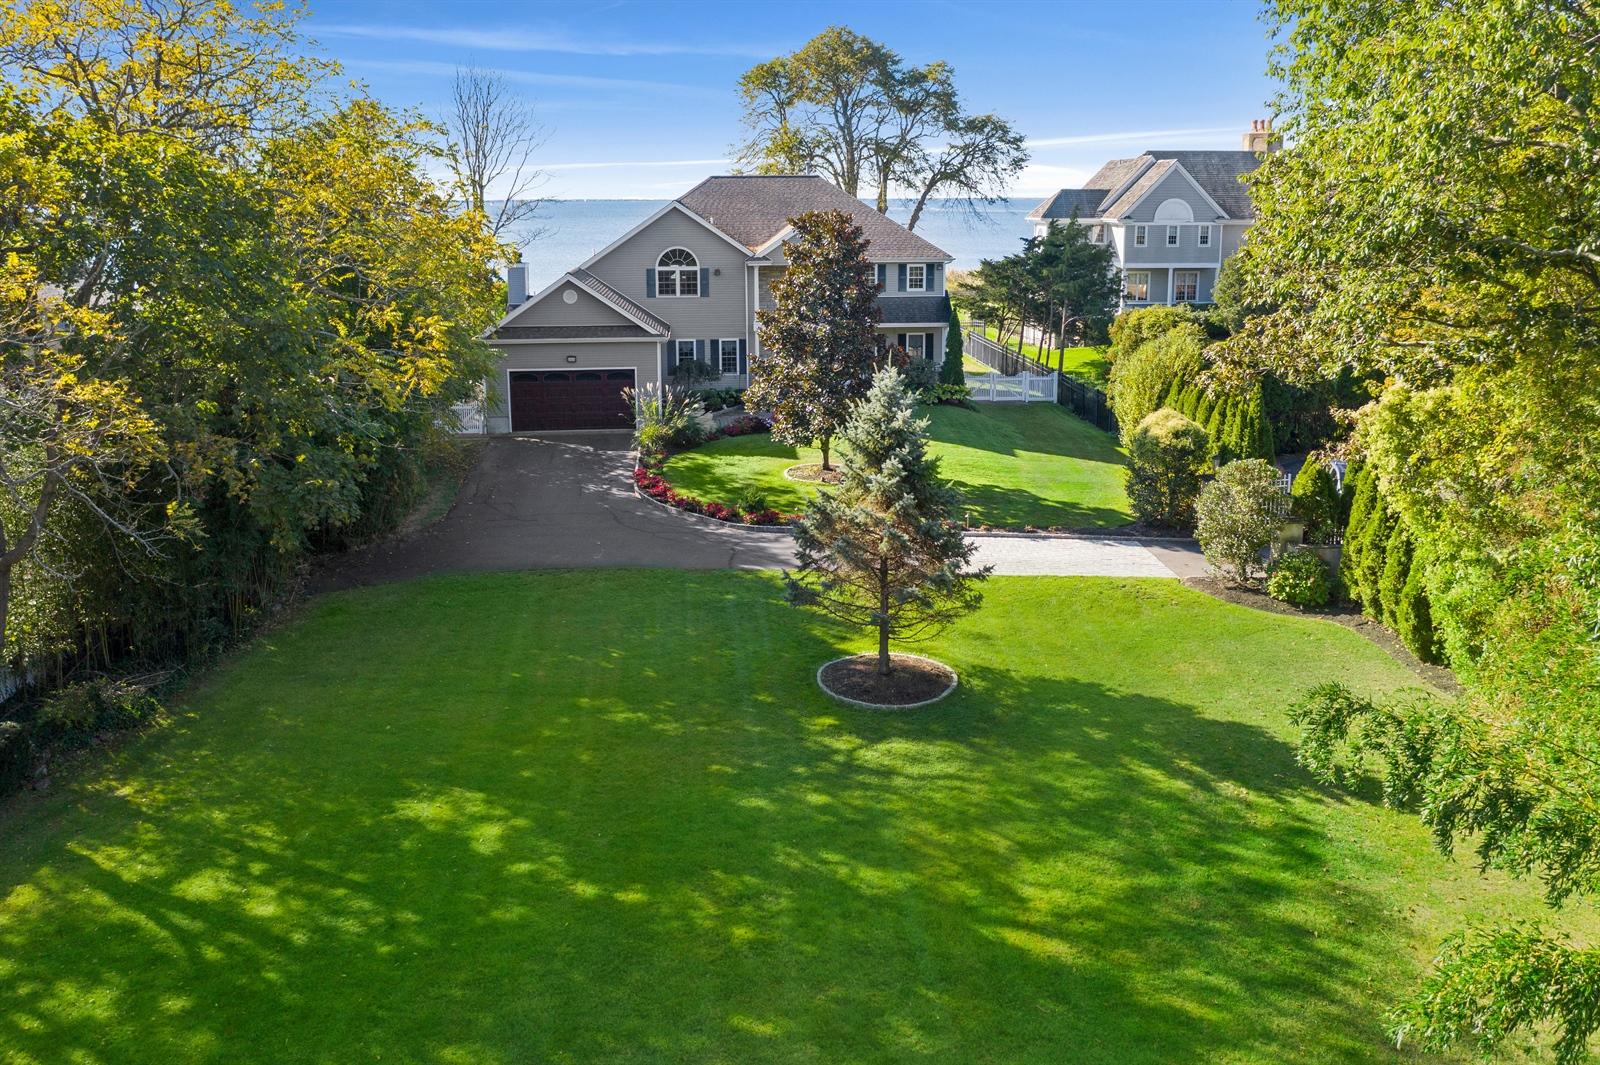 Real Estate Photography - 280 Suydam lane, Bayport, NY, 11705 -